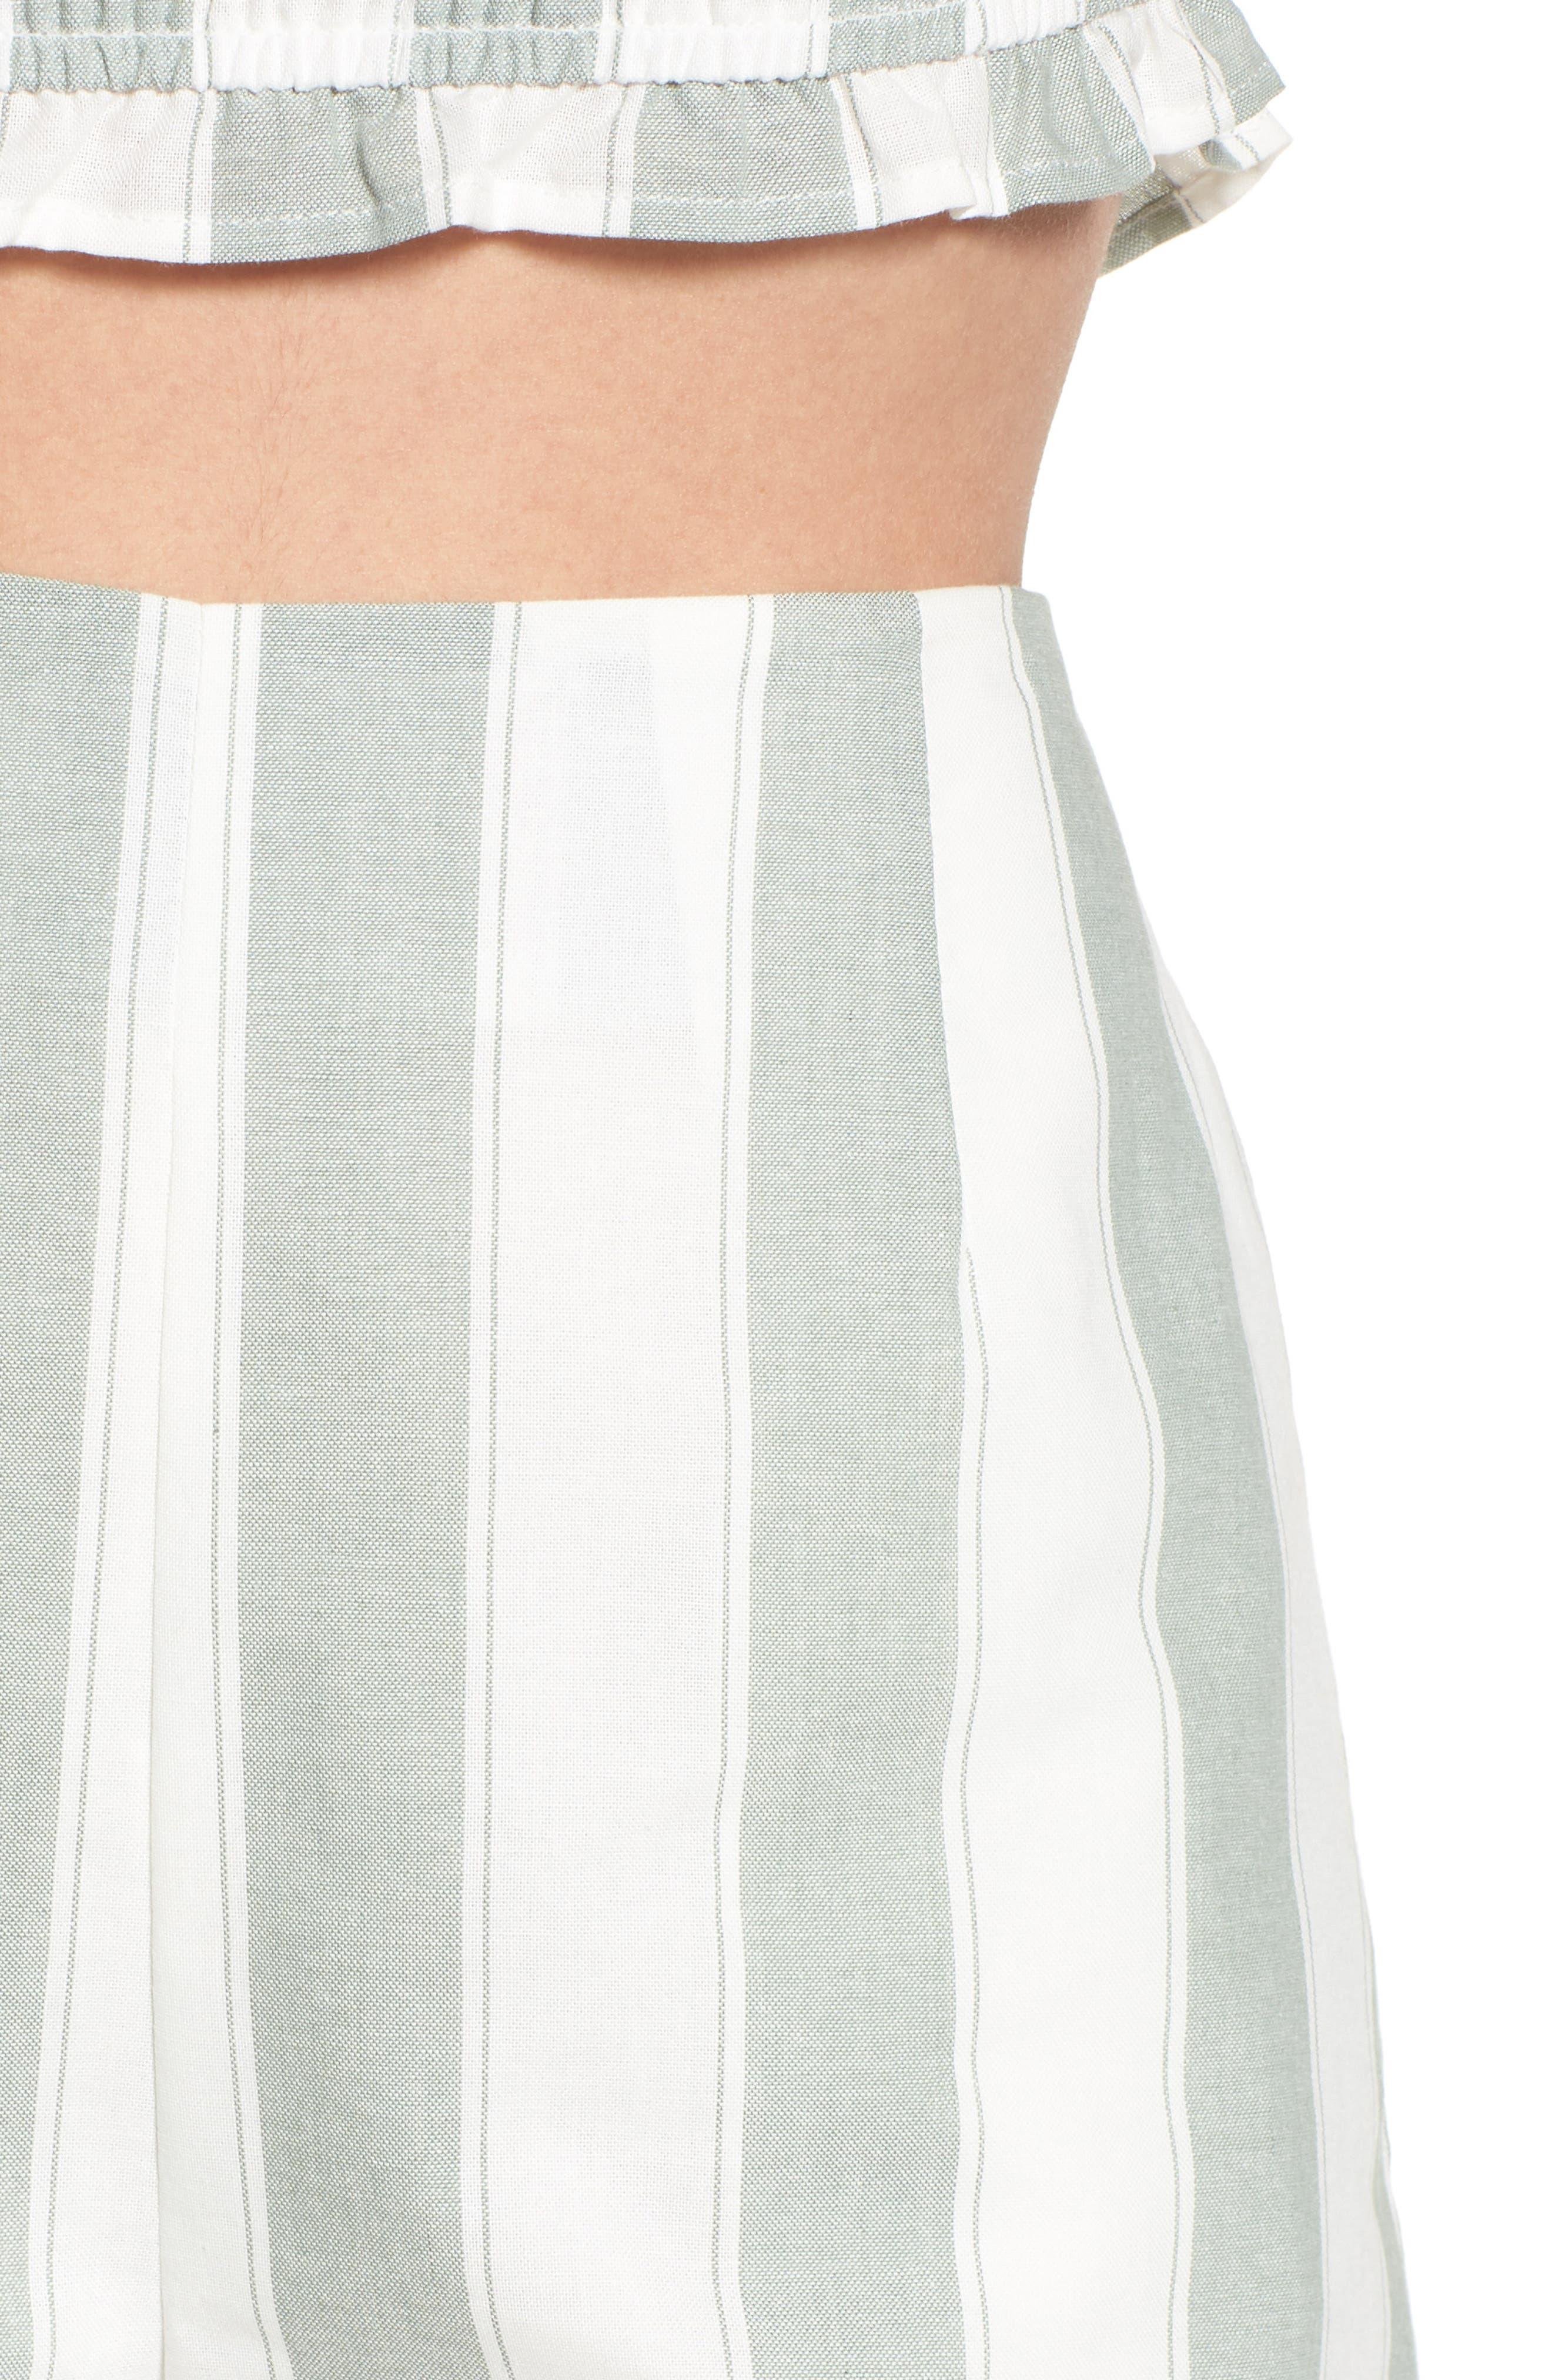 Poetic Stripe Shorts,                             Alternate thumbnail 4, color,